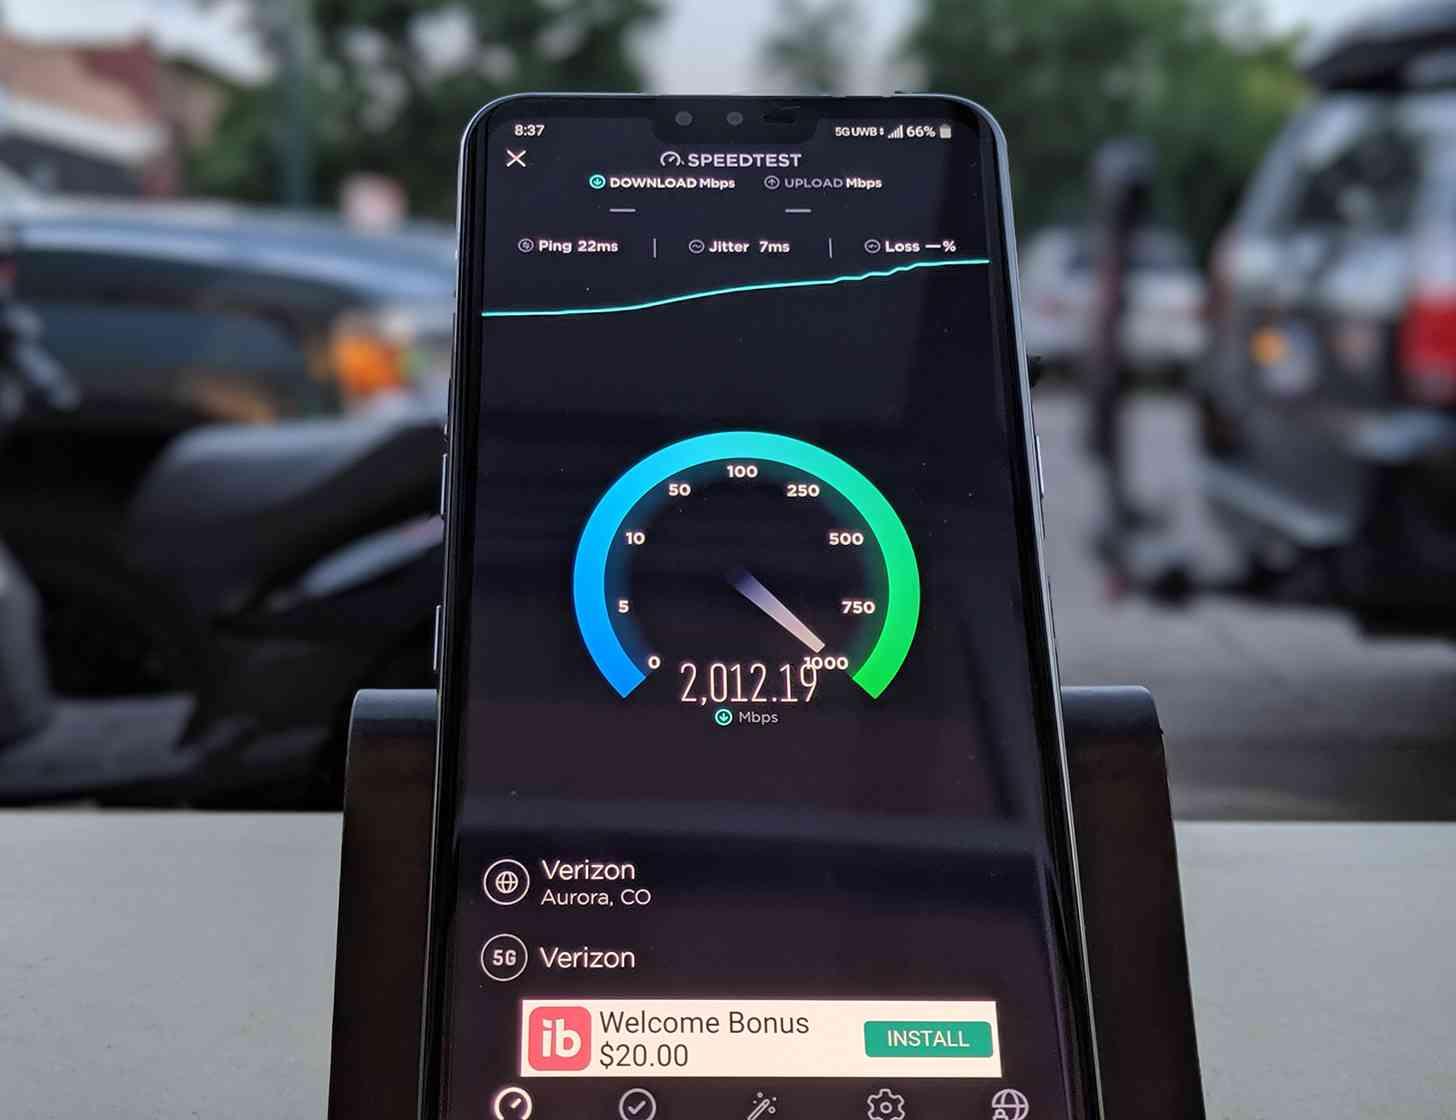 Verizon 5G Denver